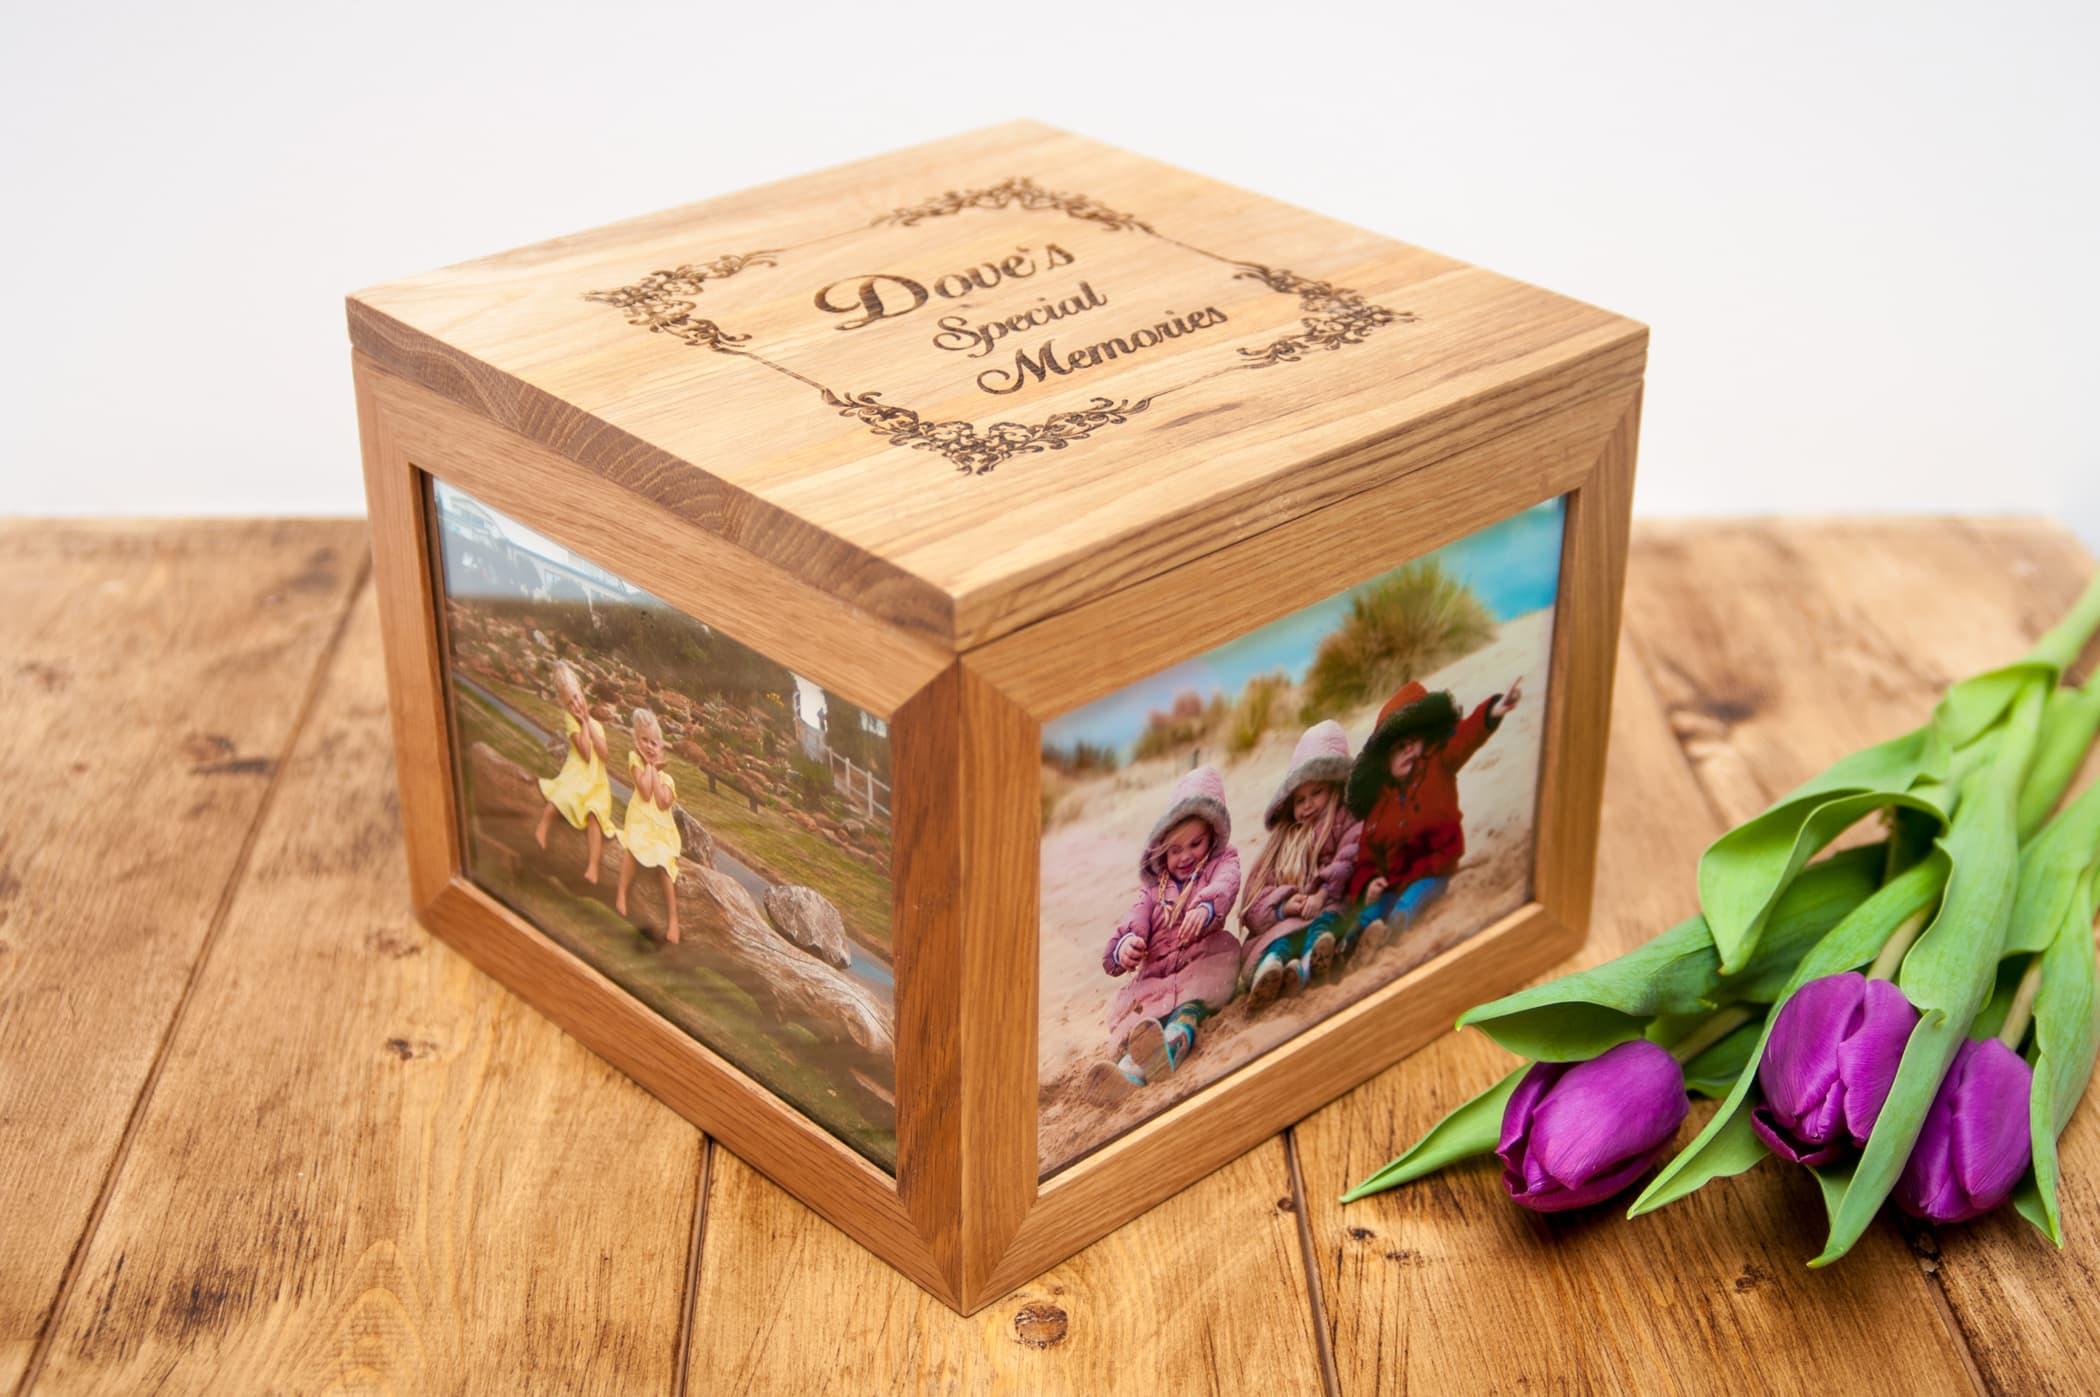 Celebrating Mothers: Win a personalised keepsake box!